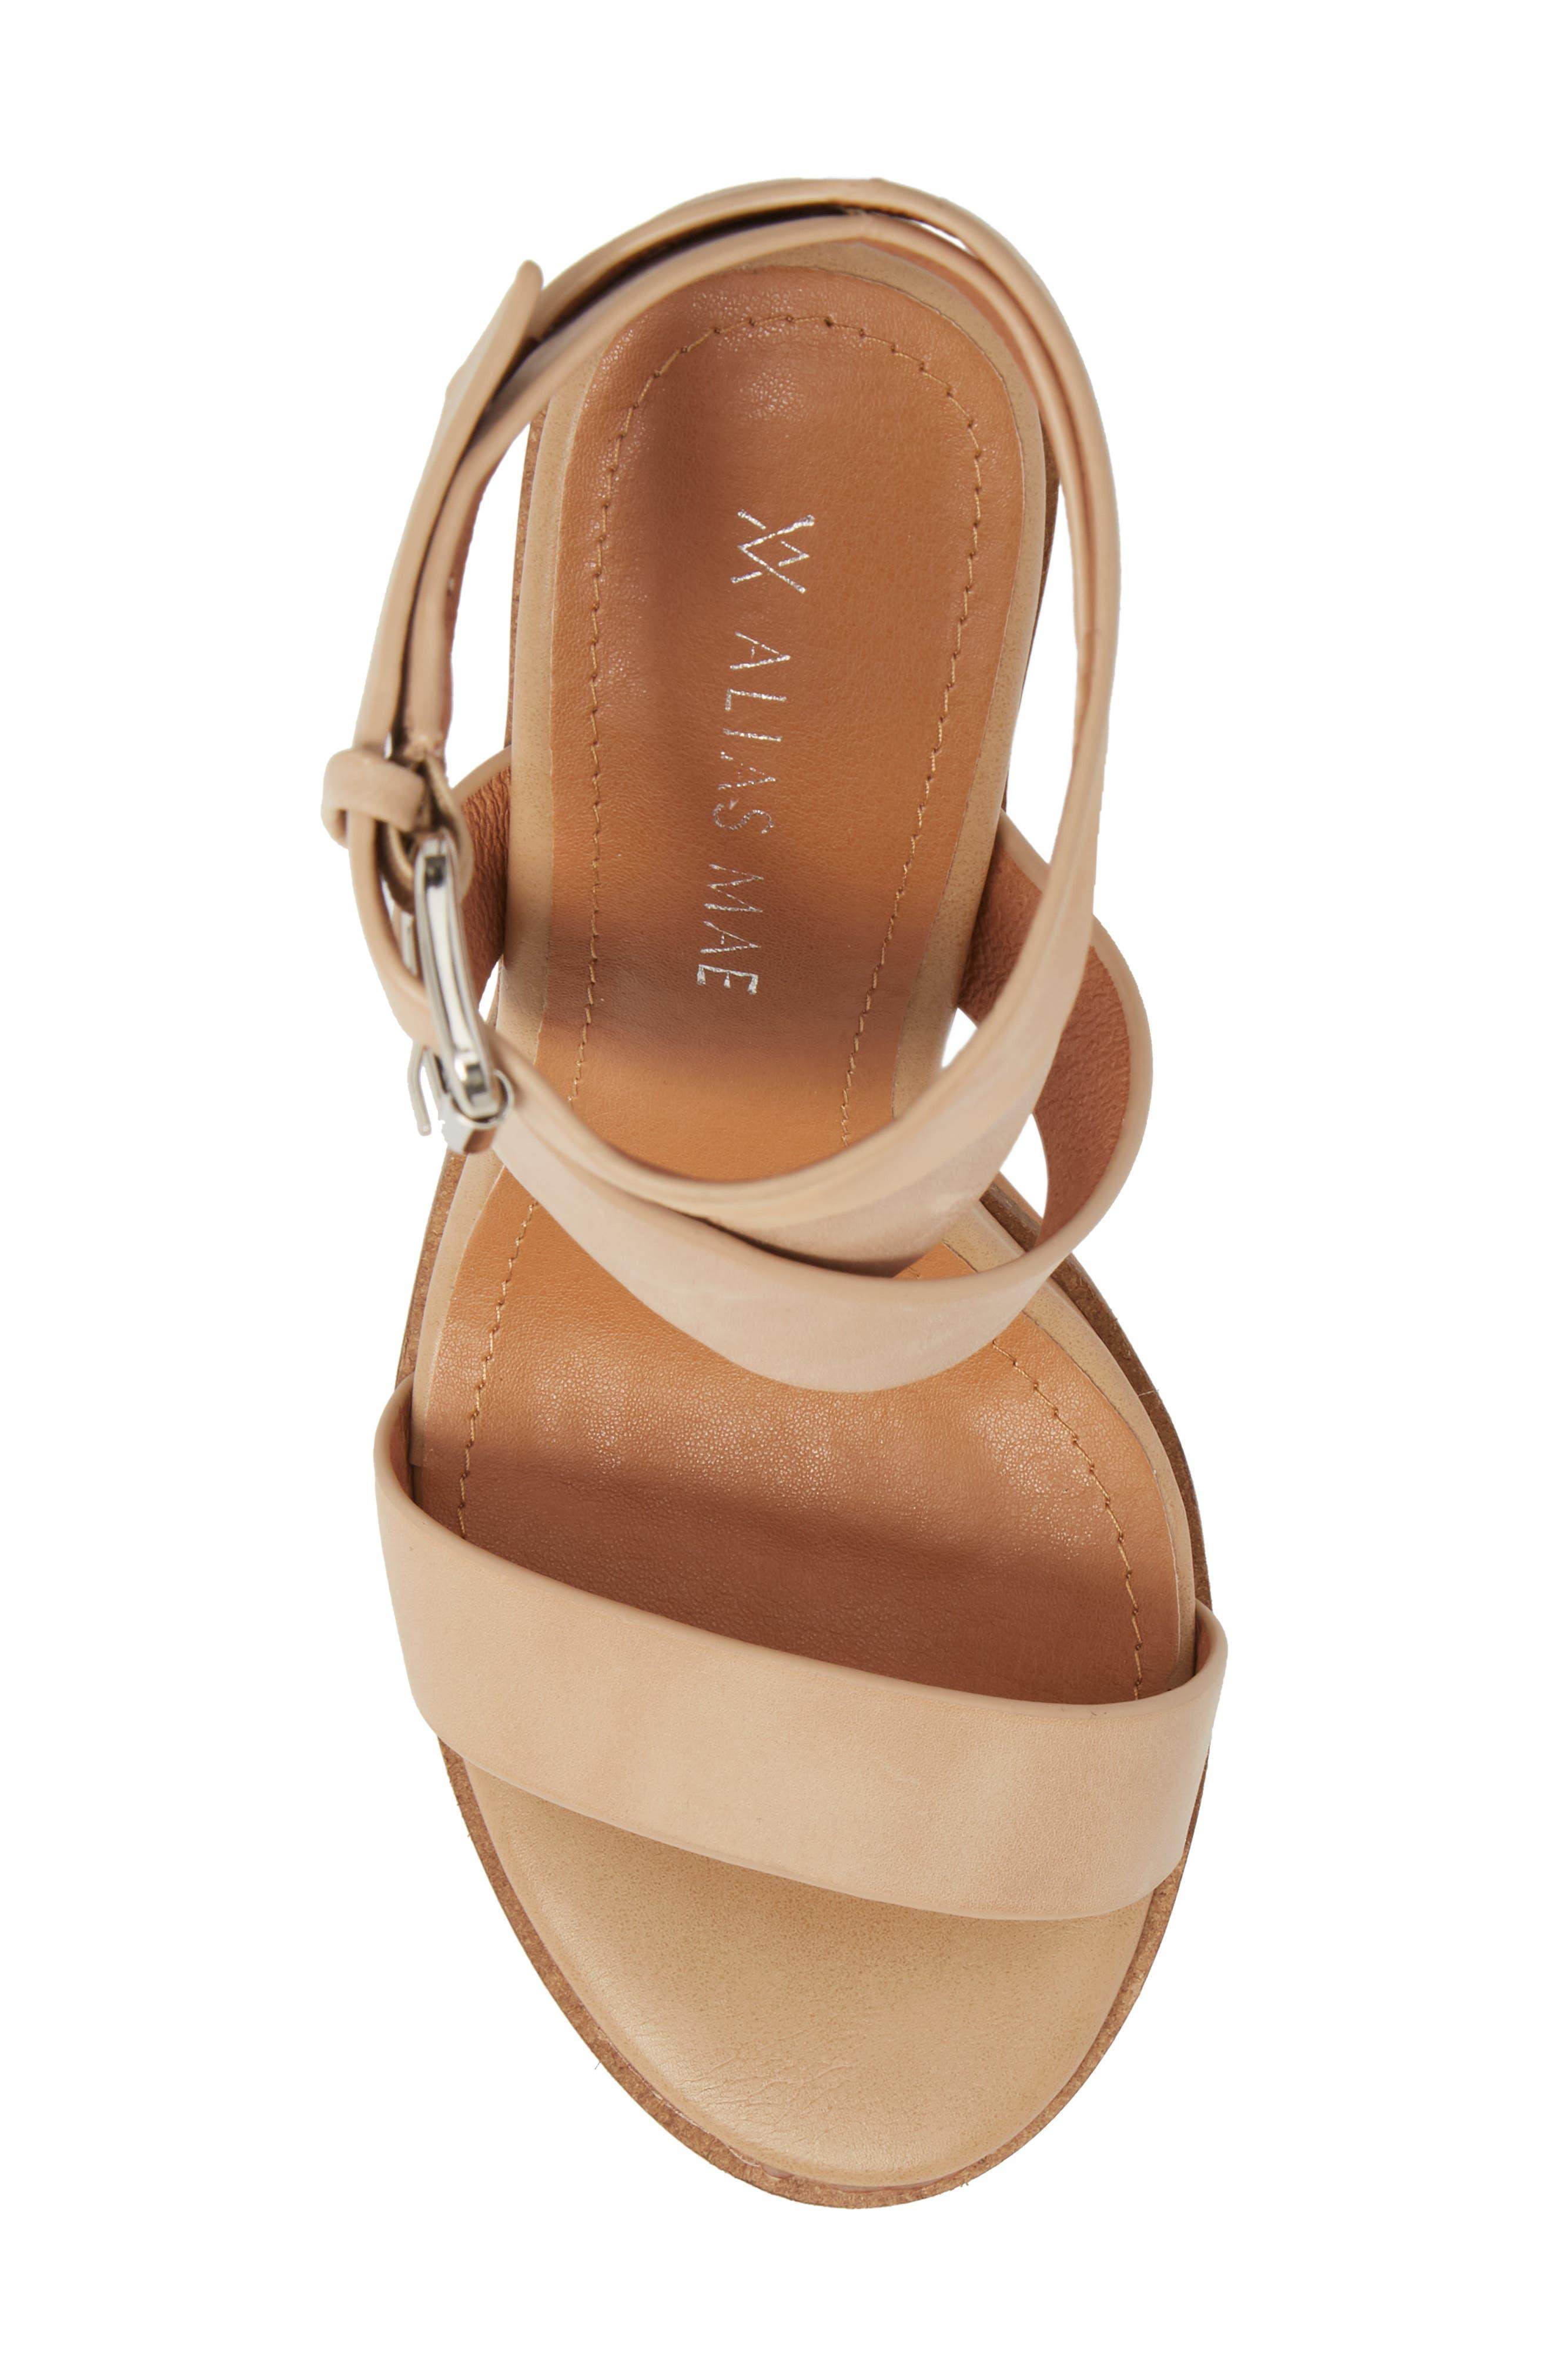 Abaala Cross Strap Sandal,                             Alternate thumbnail 5, color,                             Natural Leather